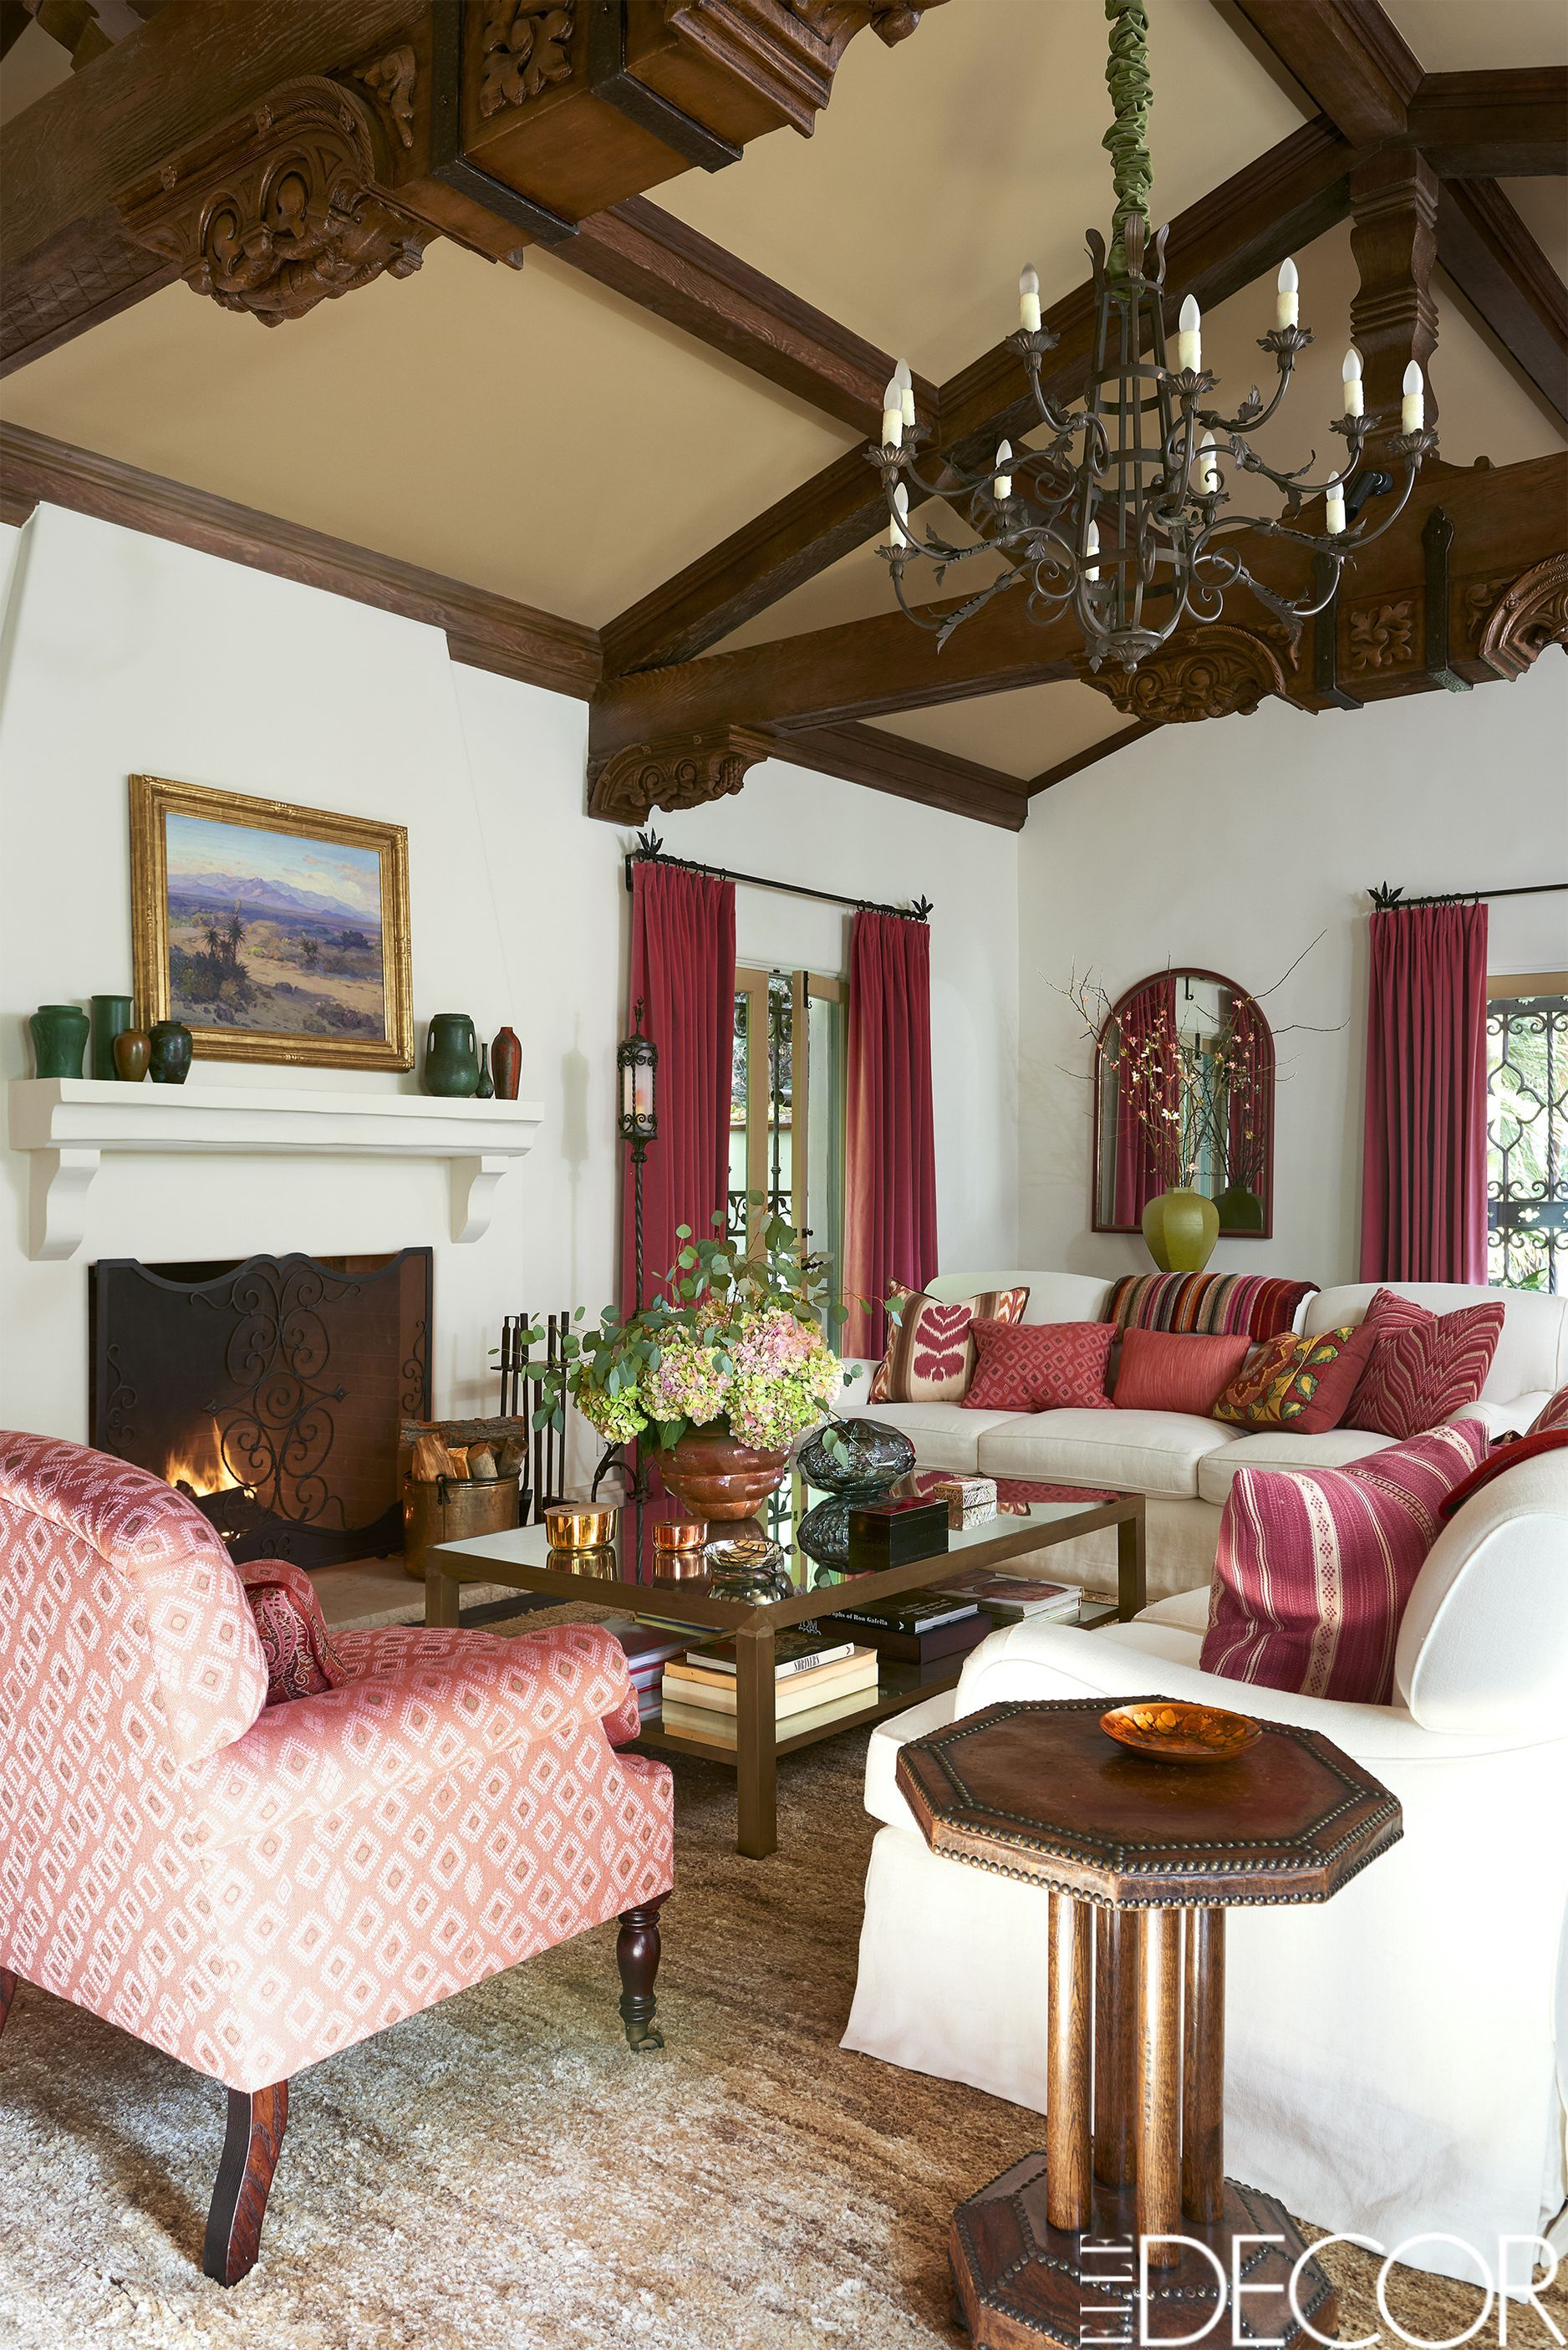 interior home decorating ideas living room style 2018 best 80 top designer decor tricks tips